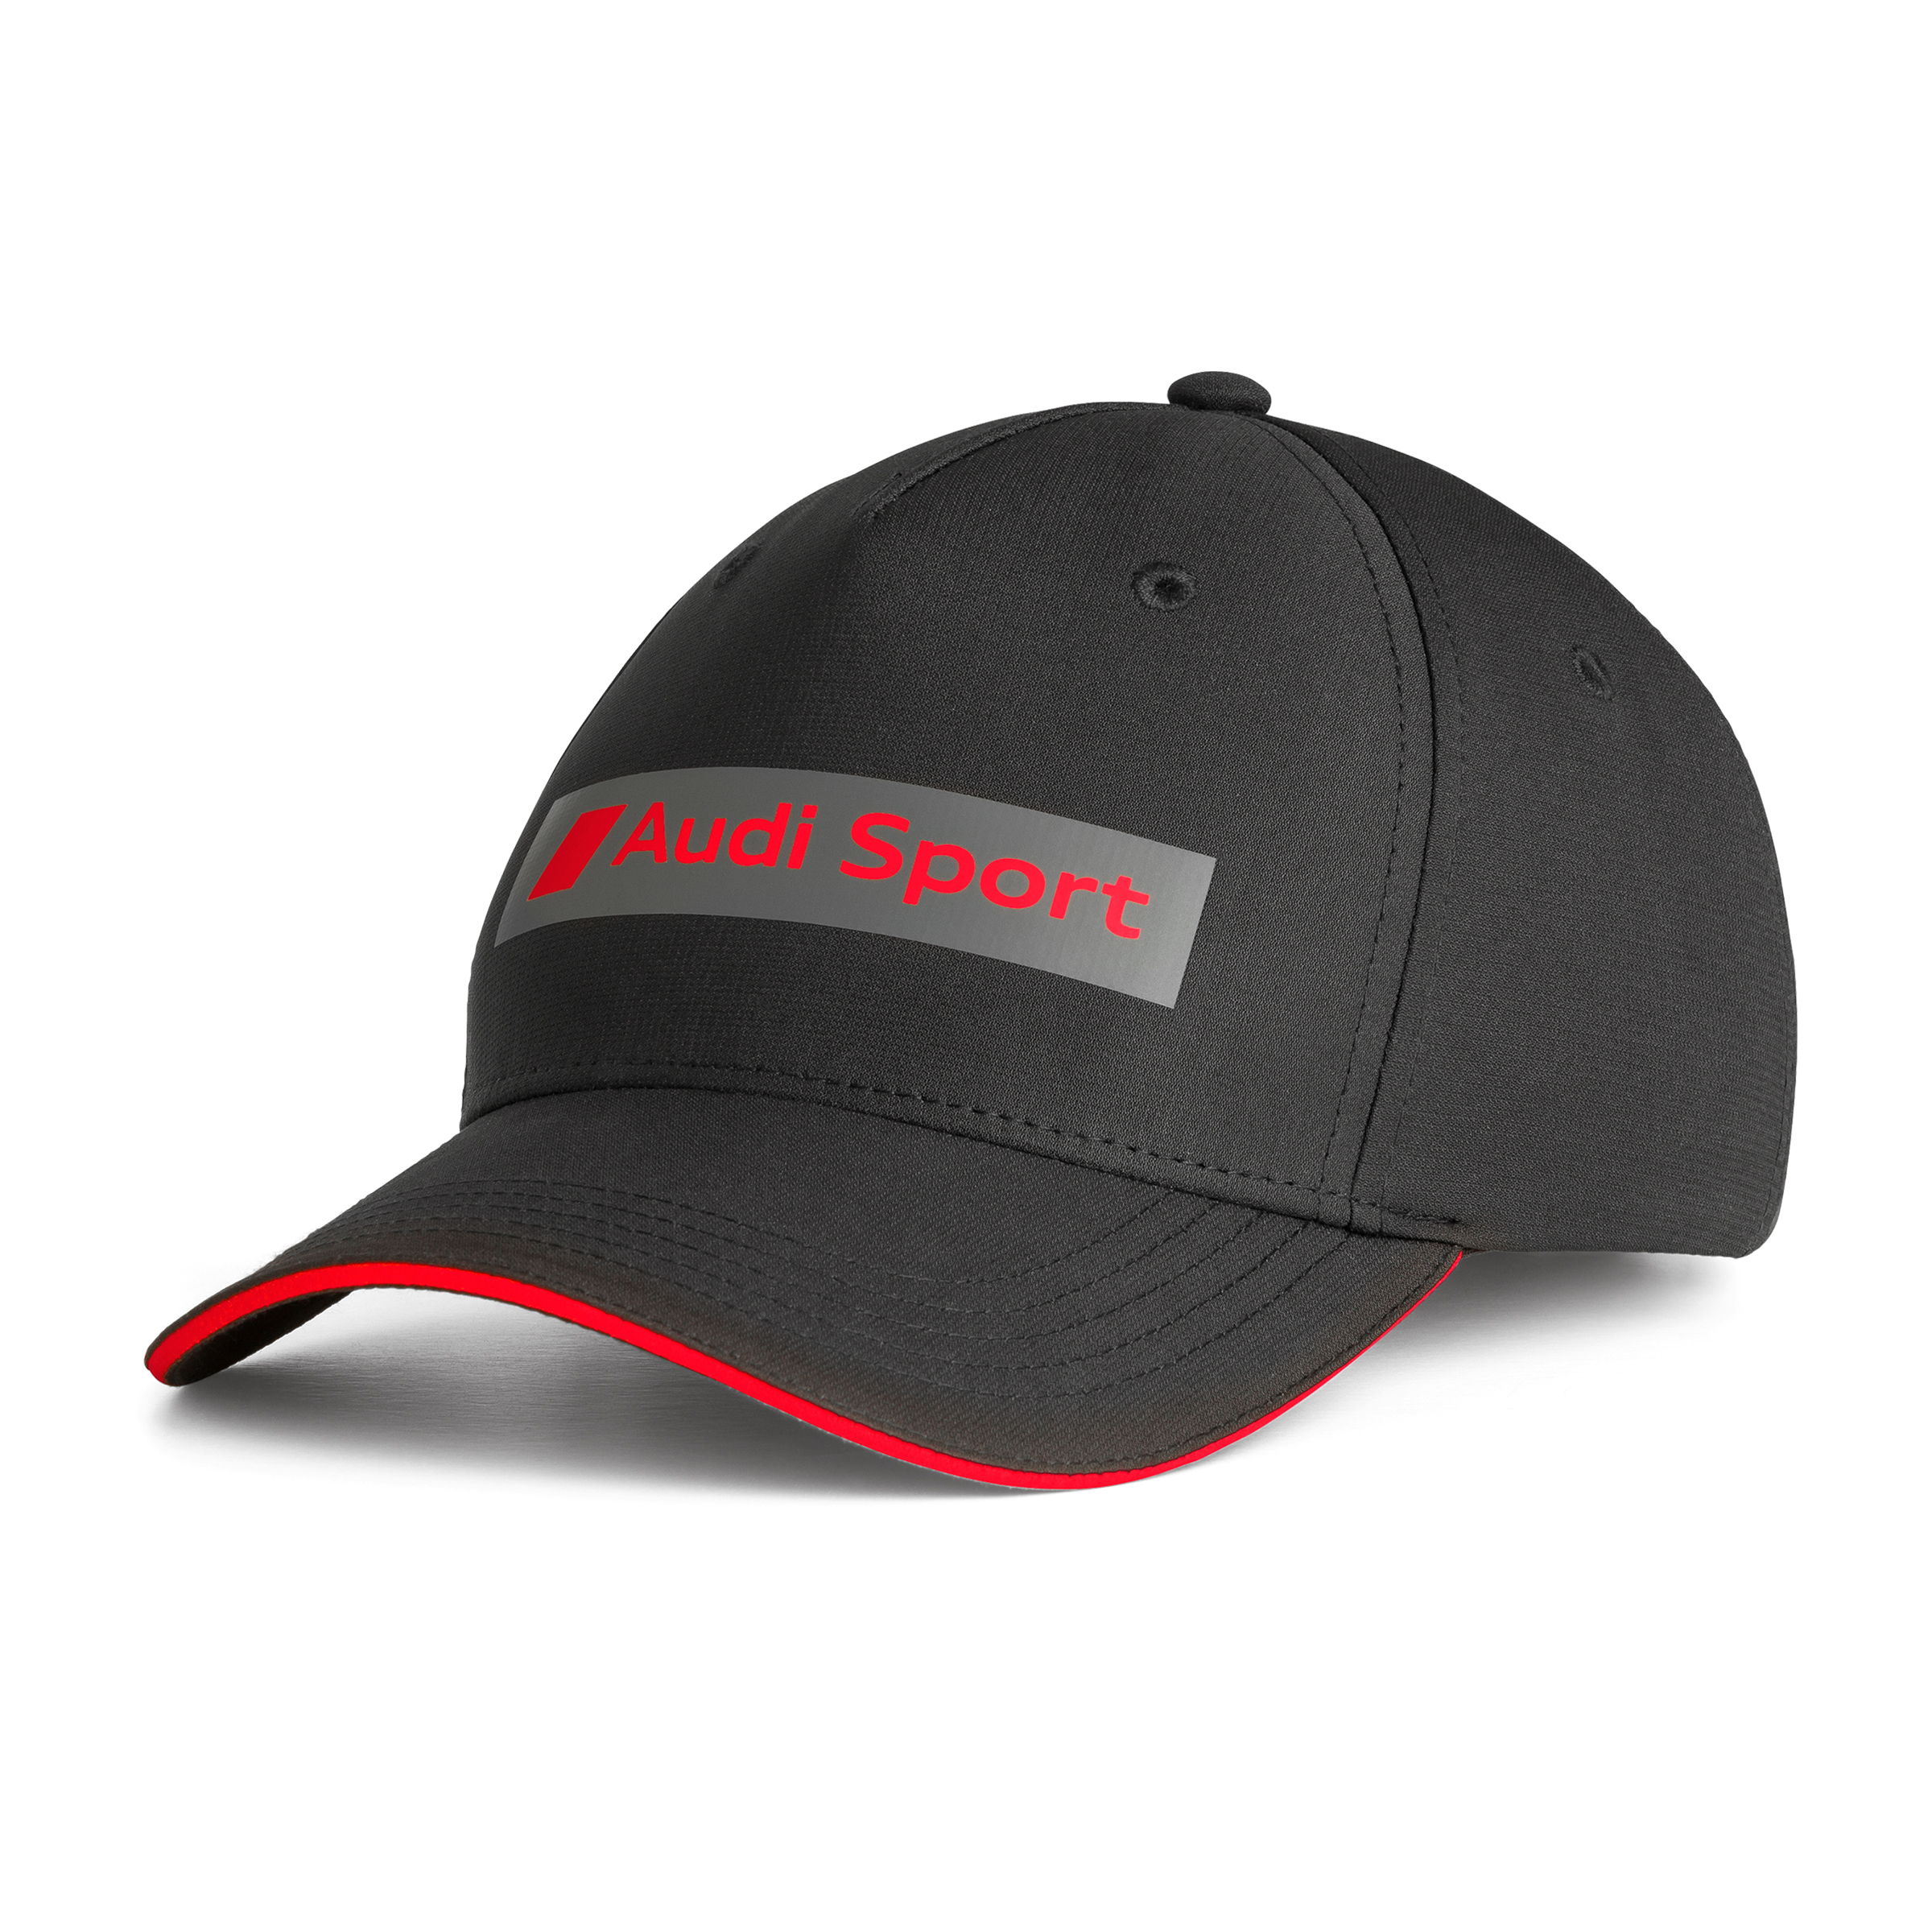 Audi Sport Cap Kappe Basecap schwarz rot